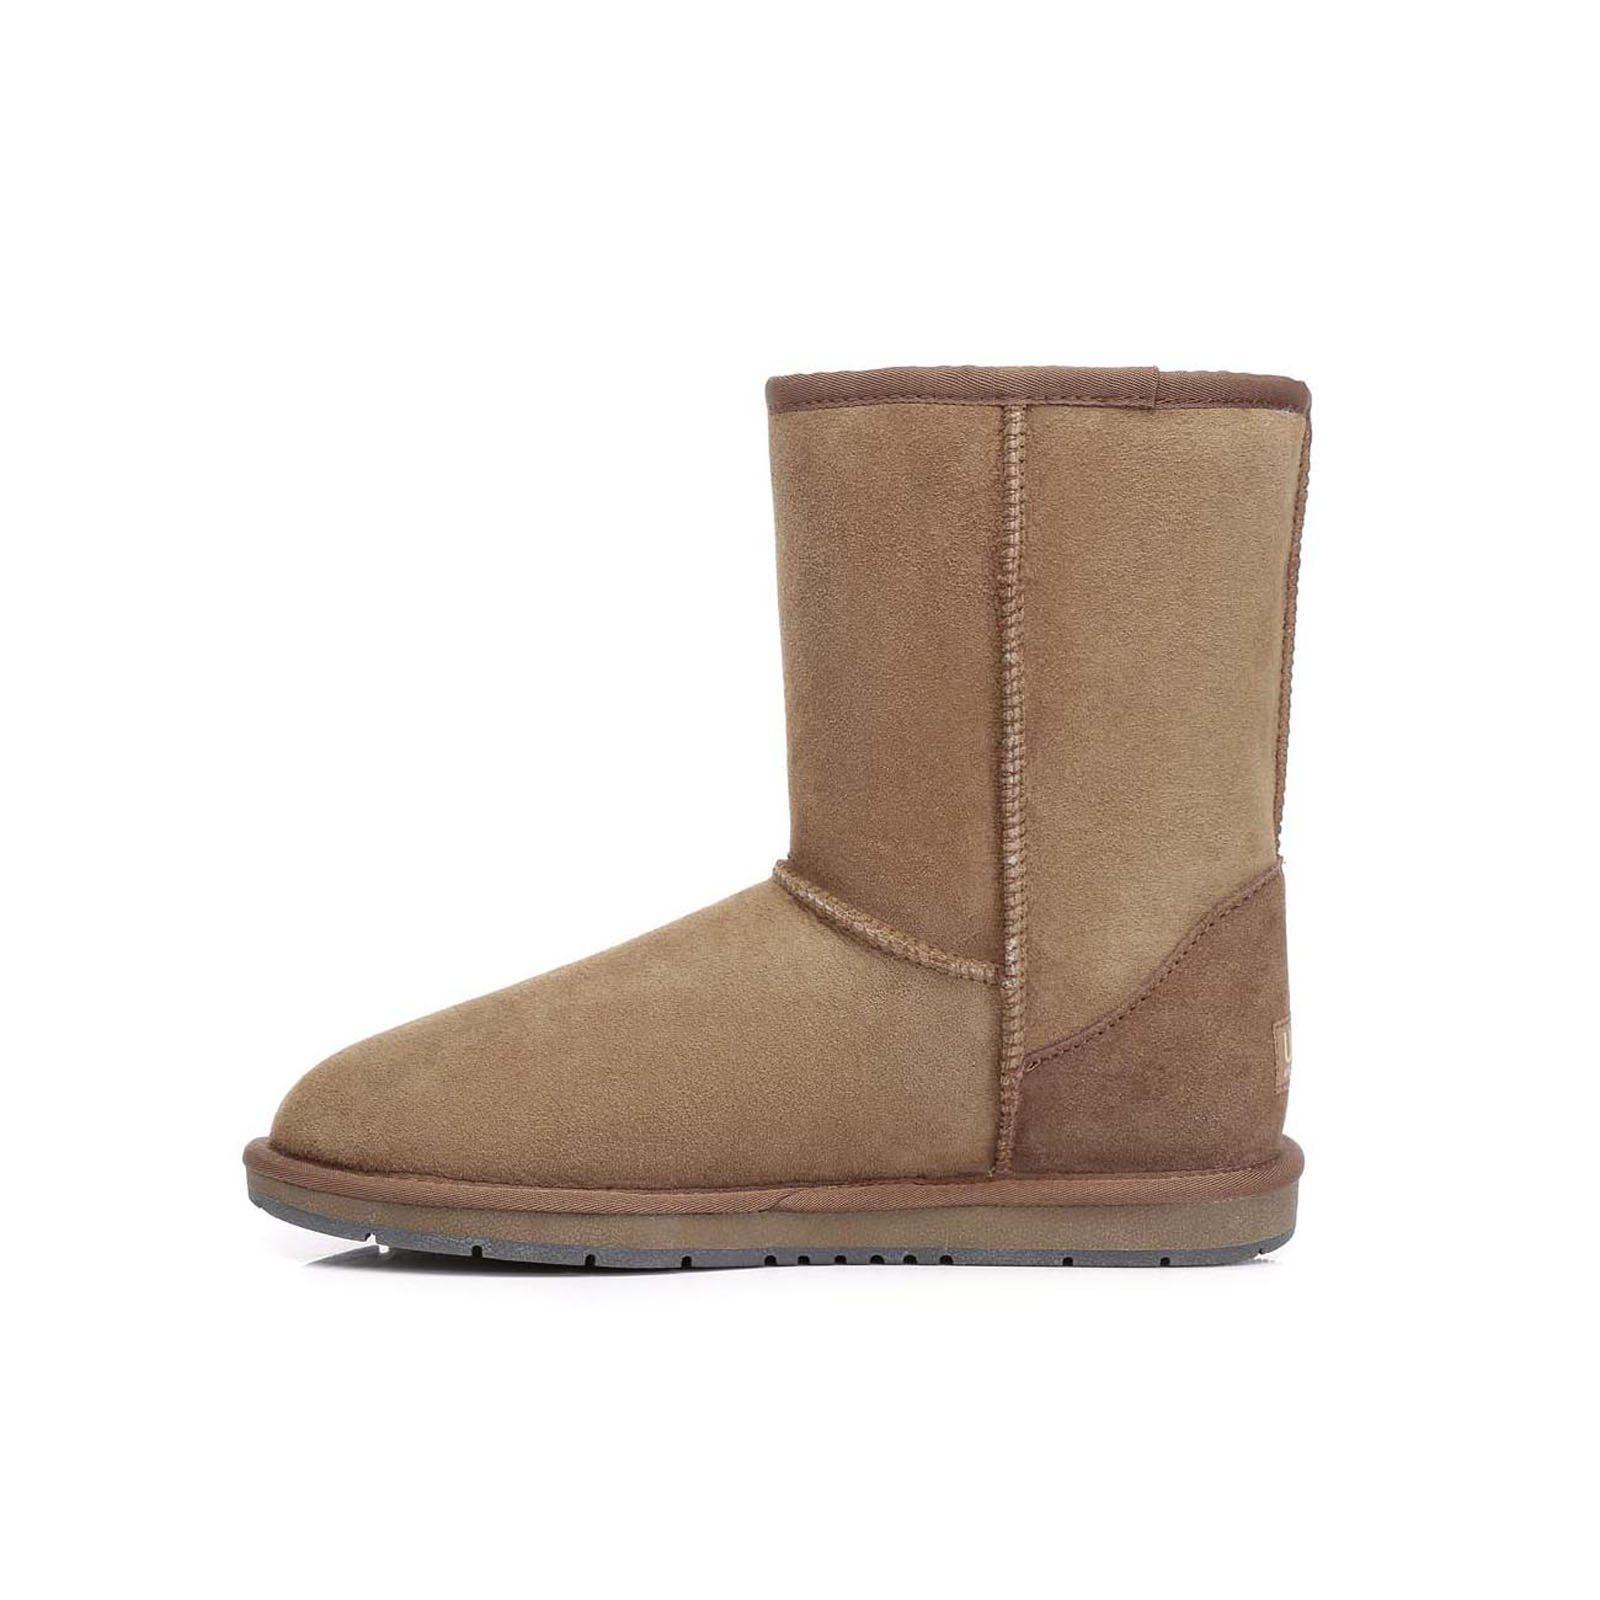 Ugg-Boots-Sheepskin-Classic-Short-Outdoor-Australian-Mens-Ladies-Size-35-44-EU